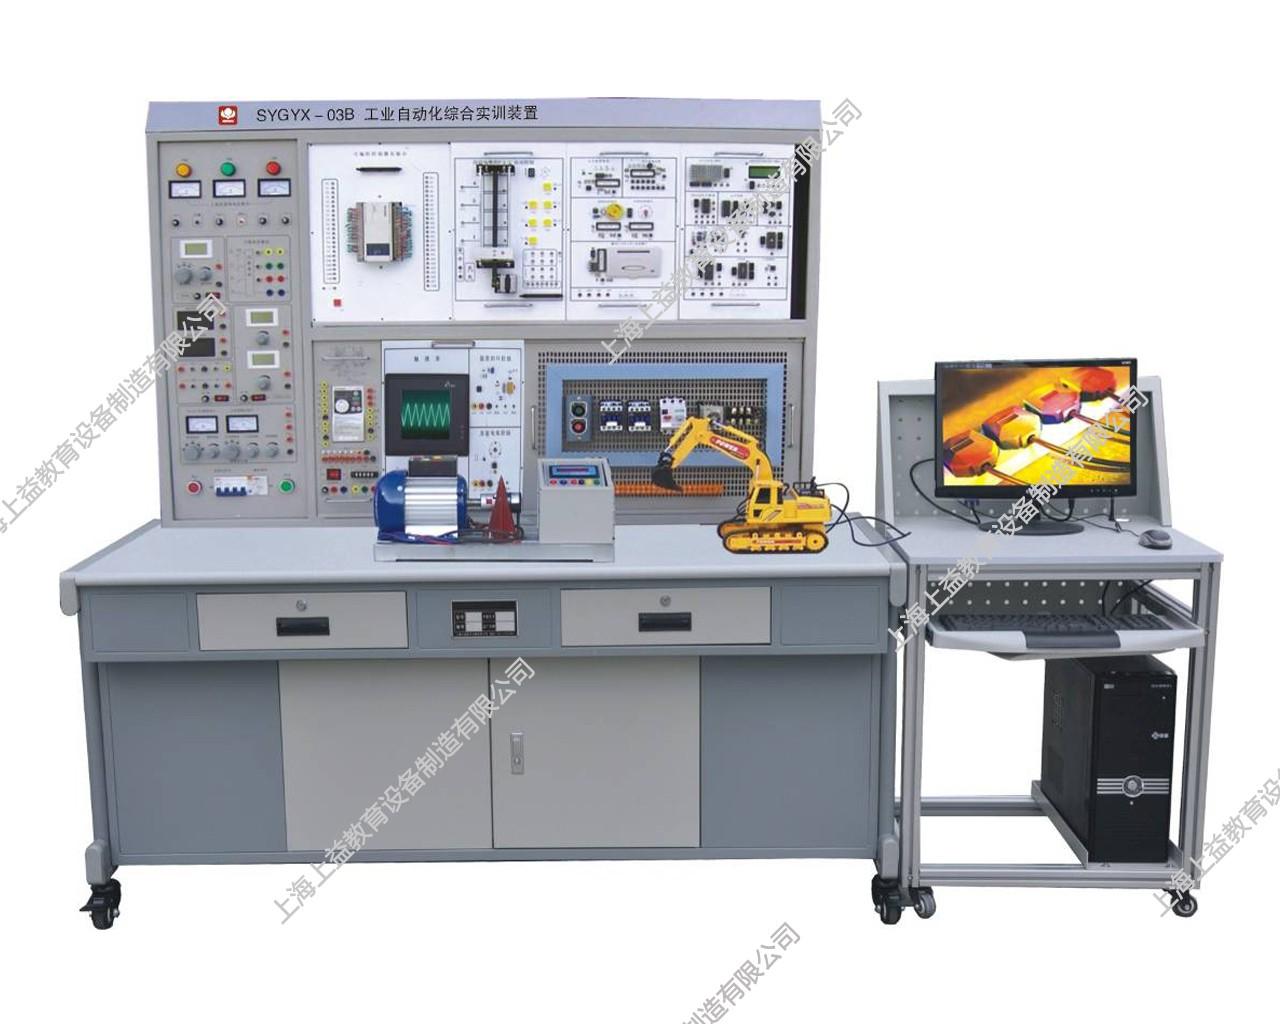 SYGYX-03B工业自动化综合wwwlehu8vip装置